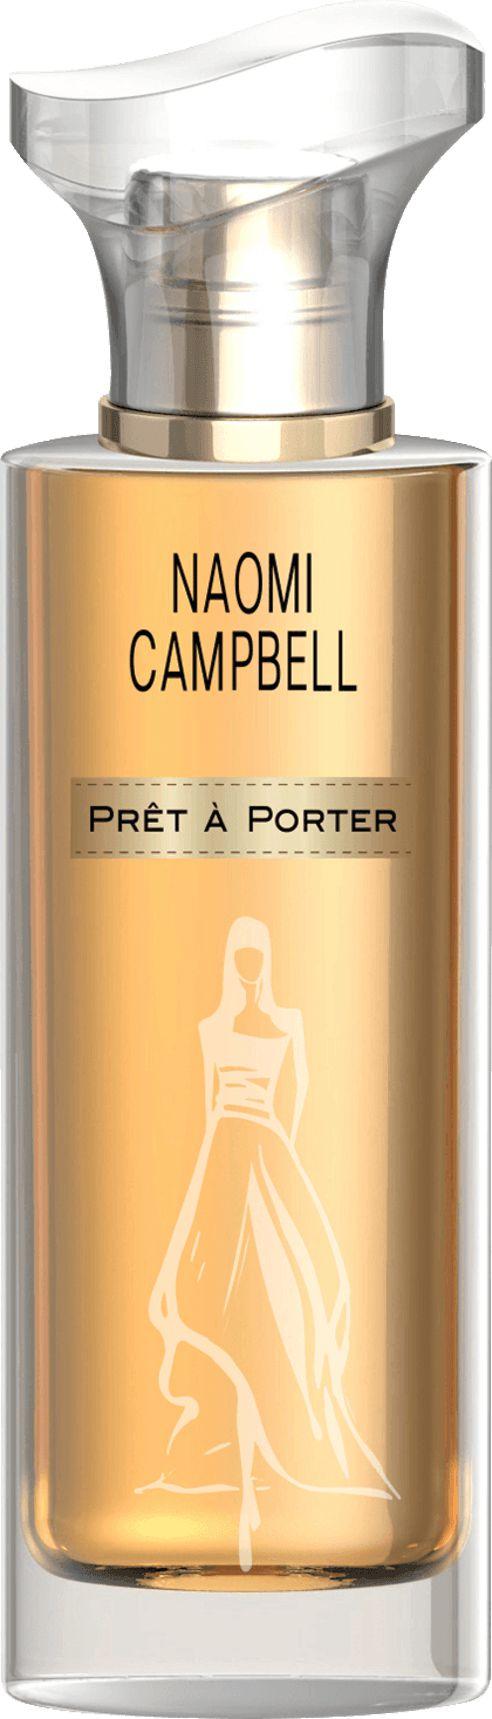 Naomi Campbell Pret a Porter EDP 30ml 5050456014101 Smaržas sievietēm